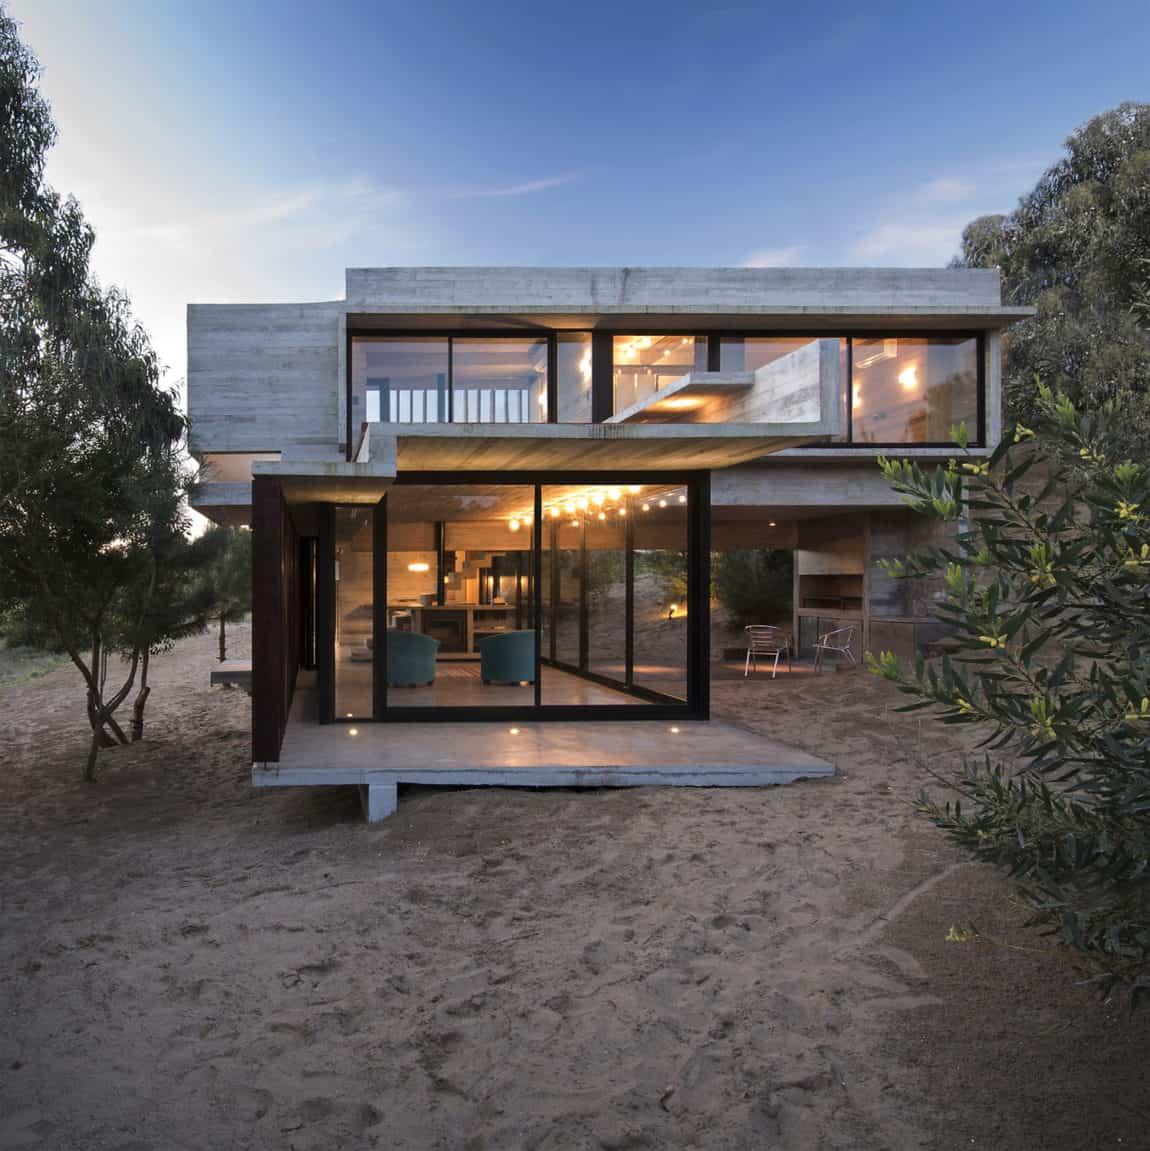 MR House by Luciano Kruk Arquitectos (14)